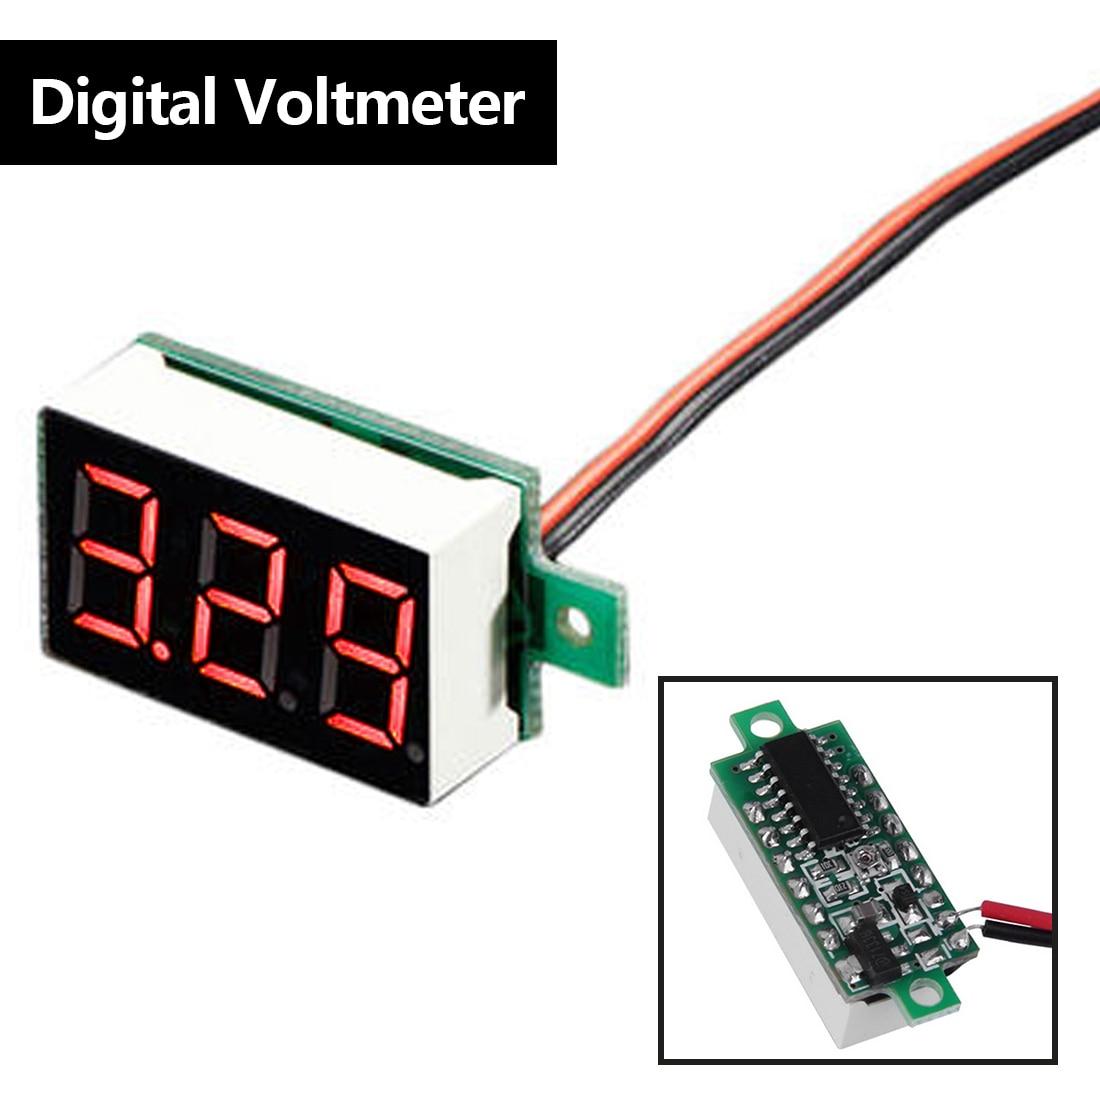 цена на 1Pcs 0.36 two-wire DC 2.50 to 32.0V LCD Digital Voltmeter Voltimetro Red LED Amp Volt Meter Gauge Voltage Meter